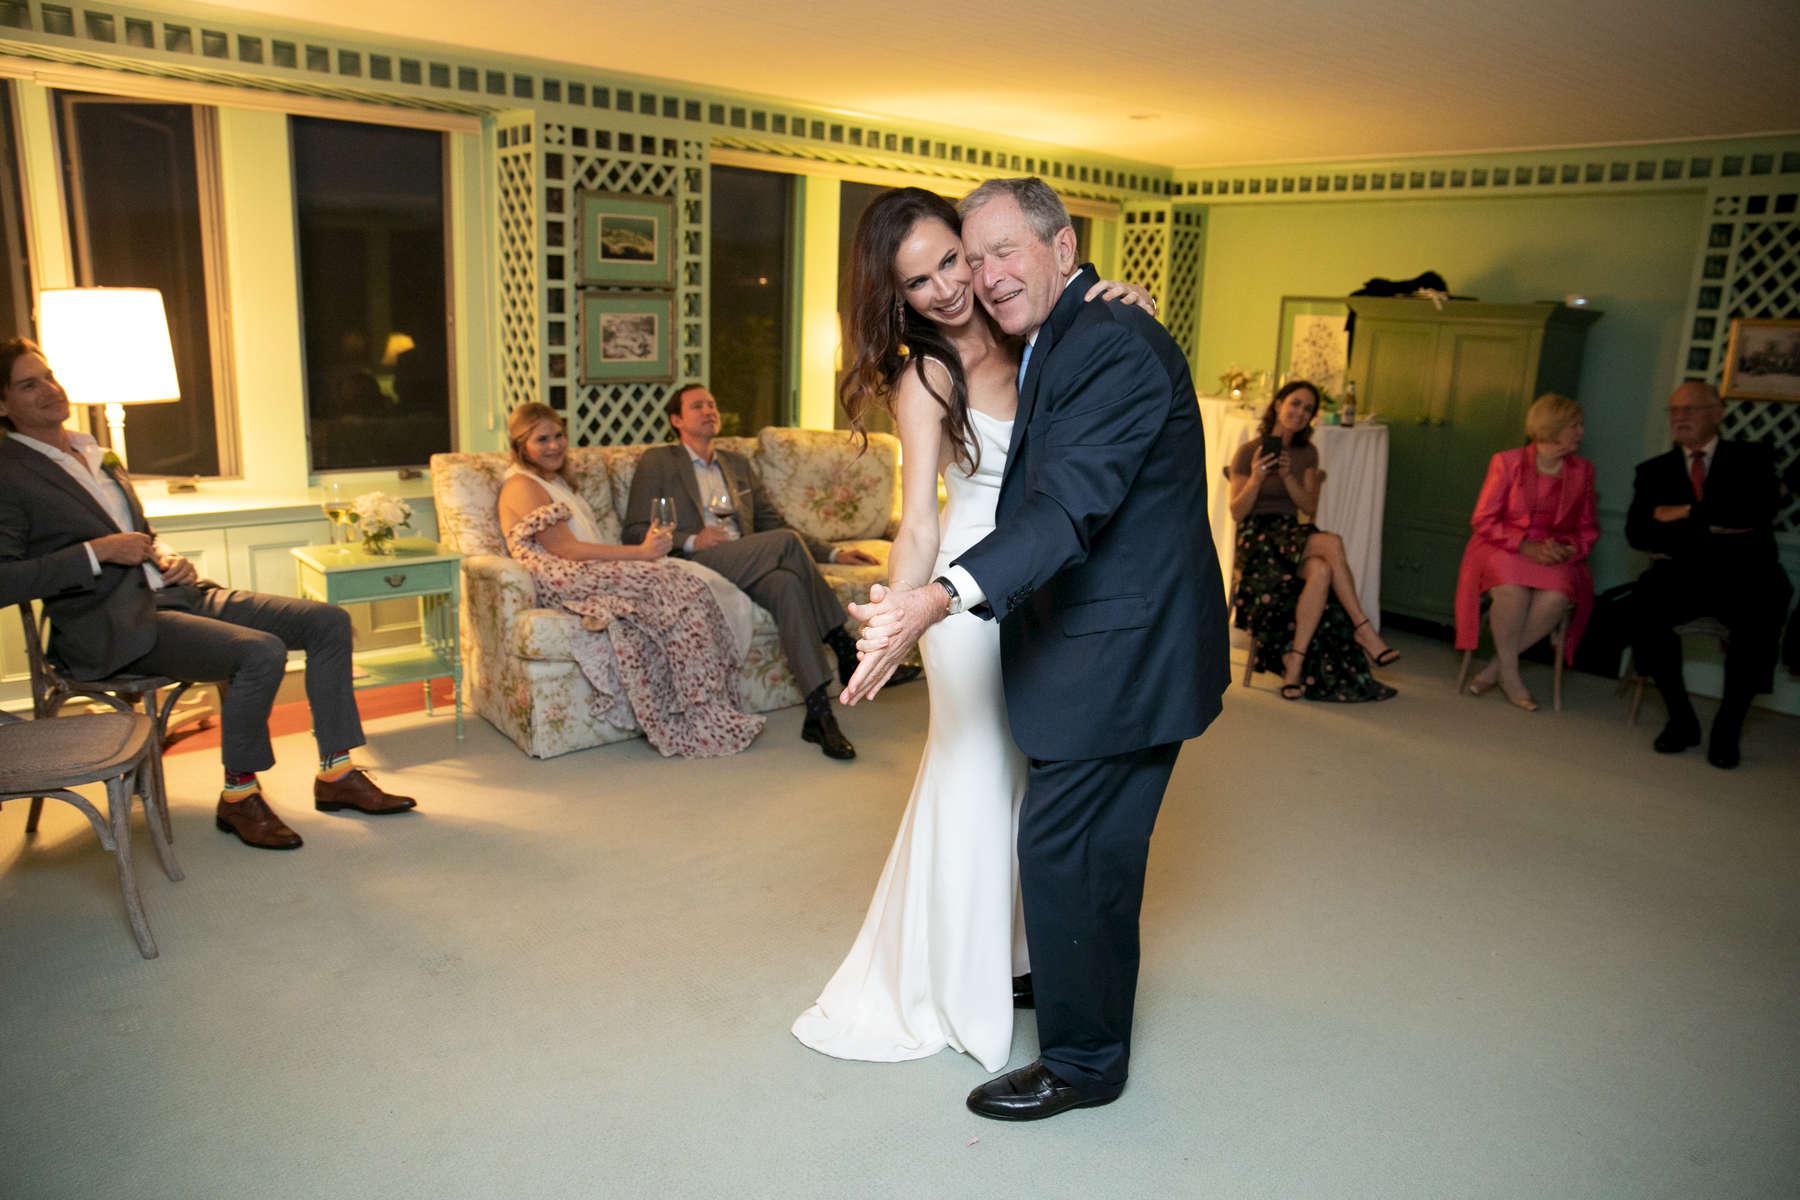 Barbara Bush and Craig Coyne wedding on October 7, 2018. Photo by Paul Morse